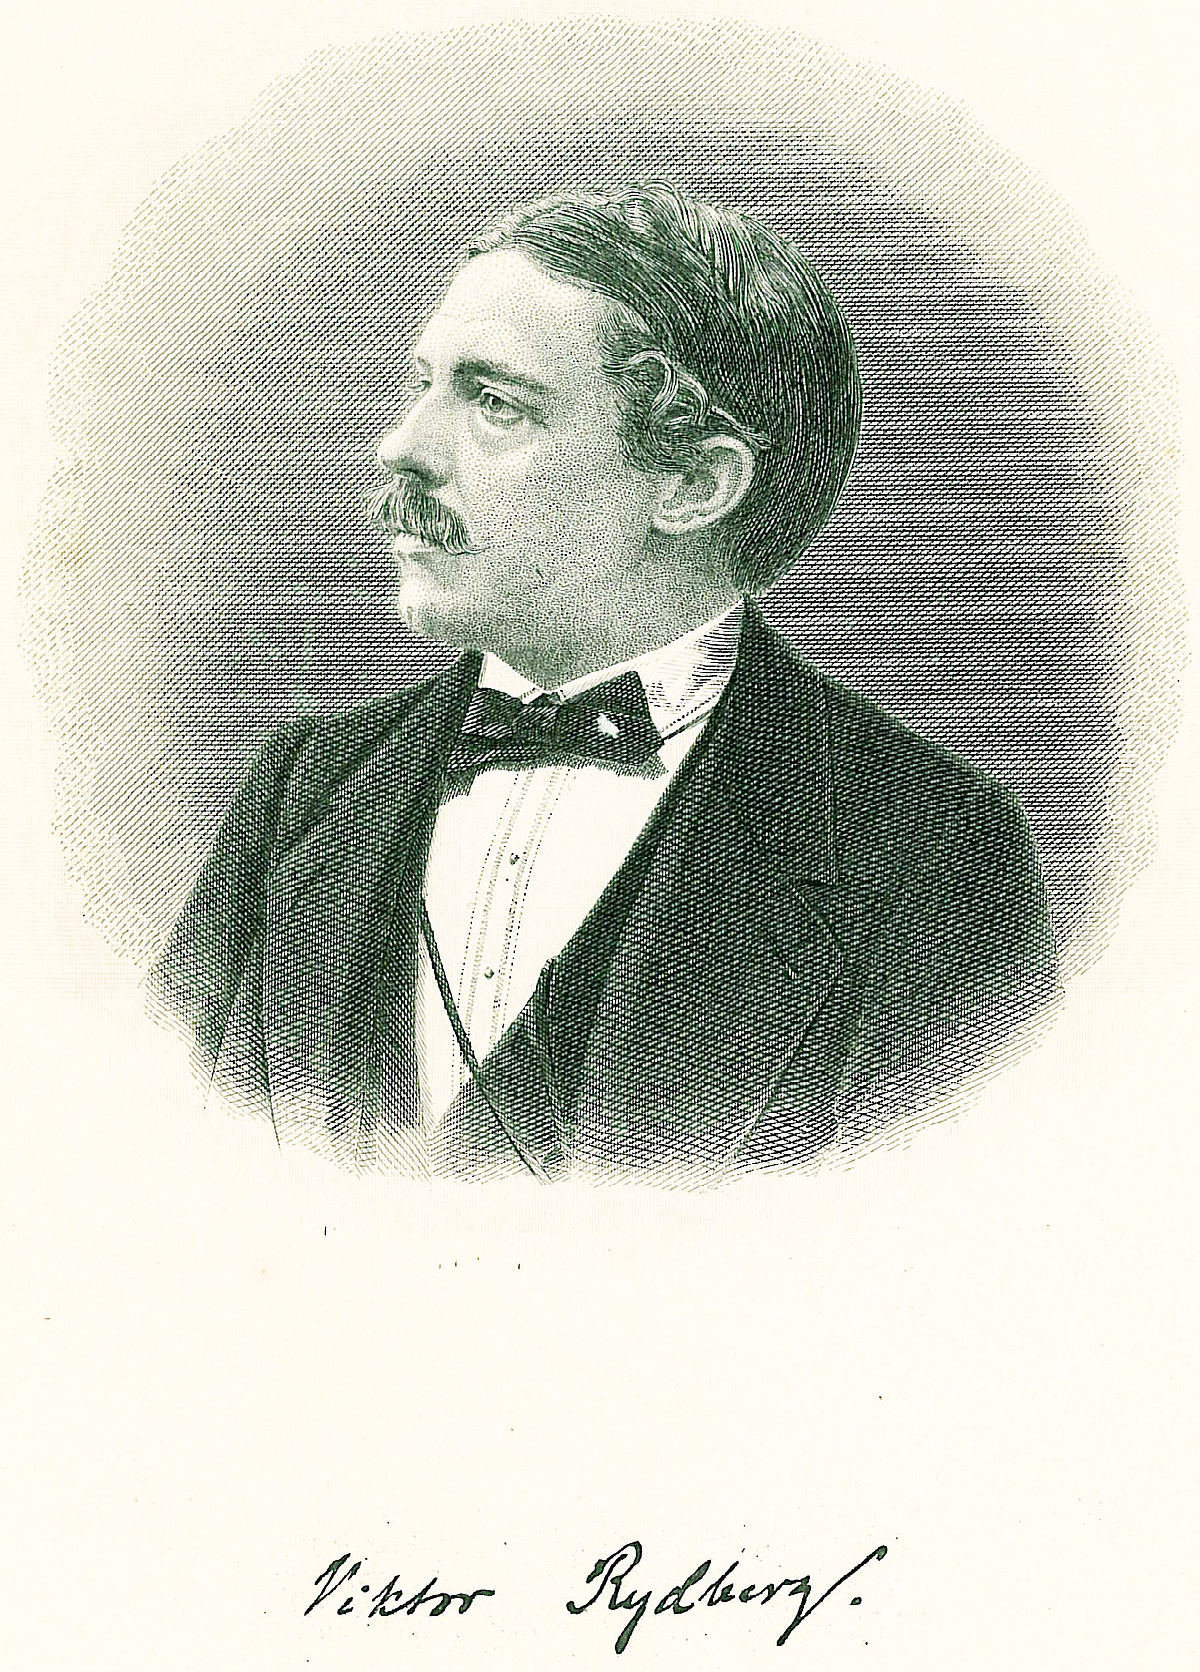 Swedish author Viktor rydberg with signature.jpg